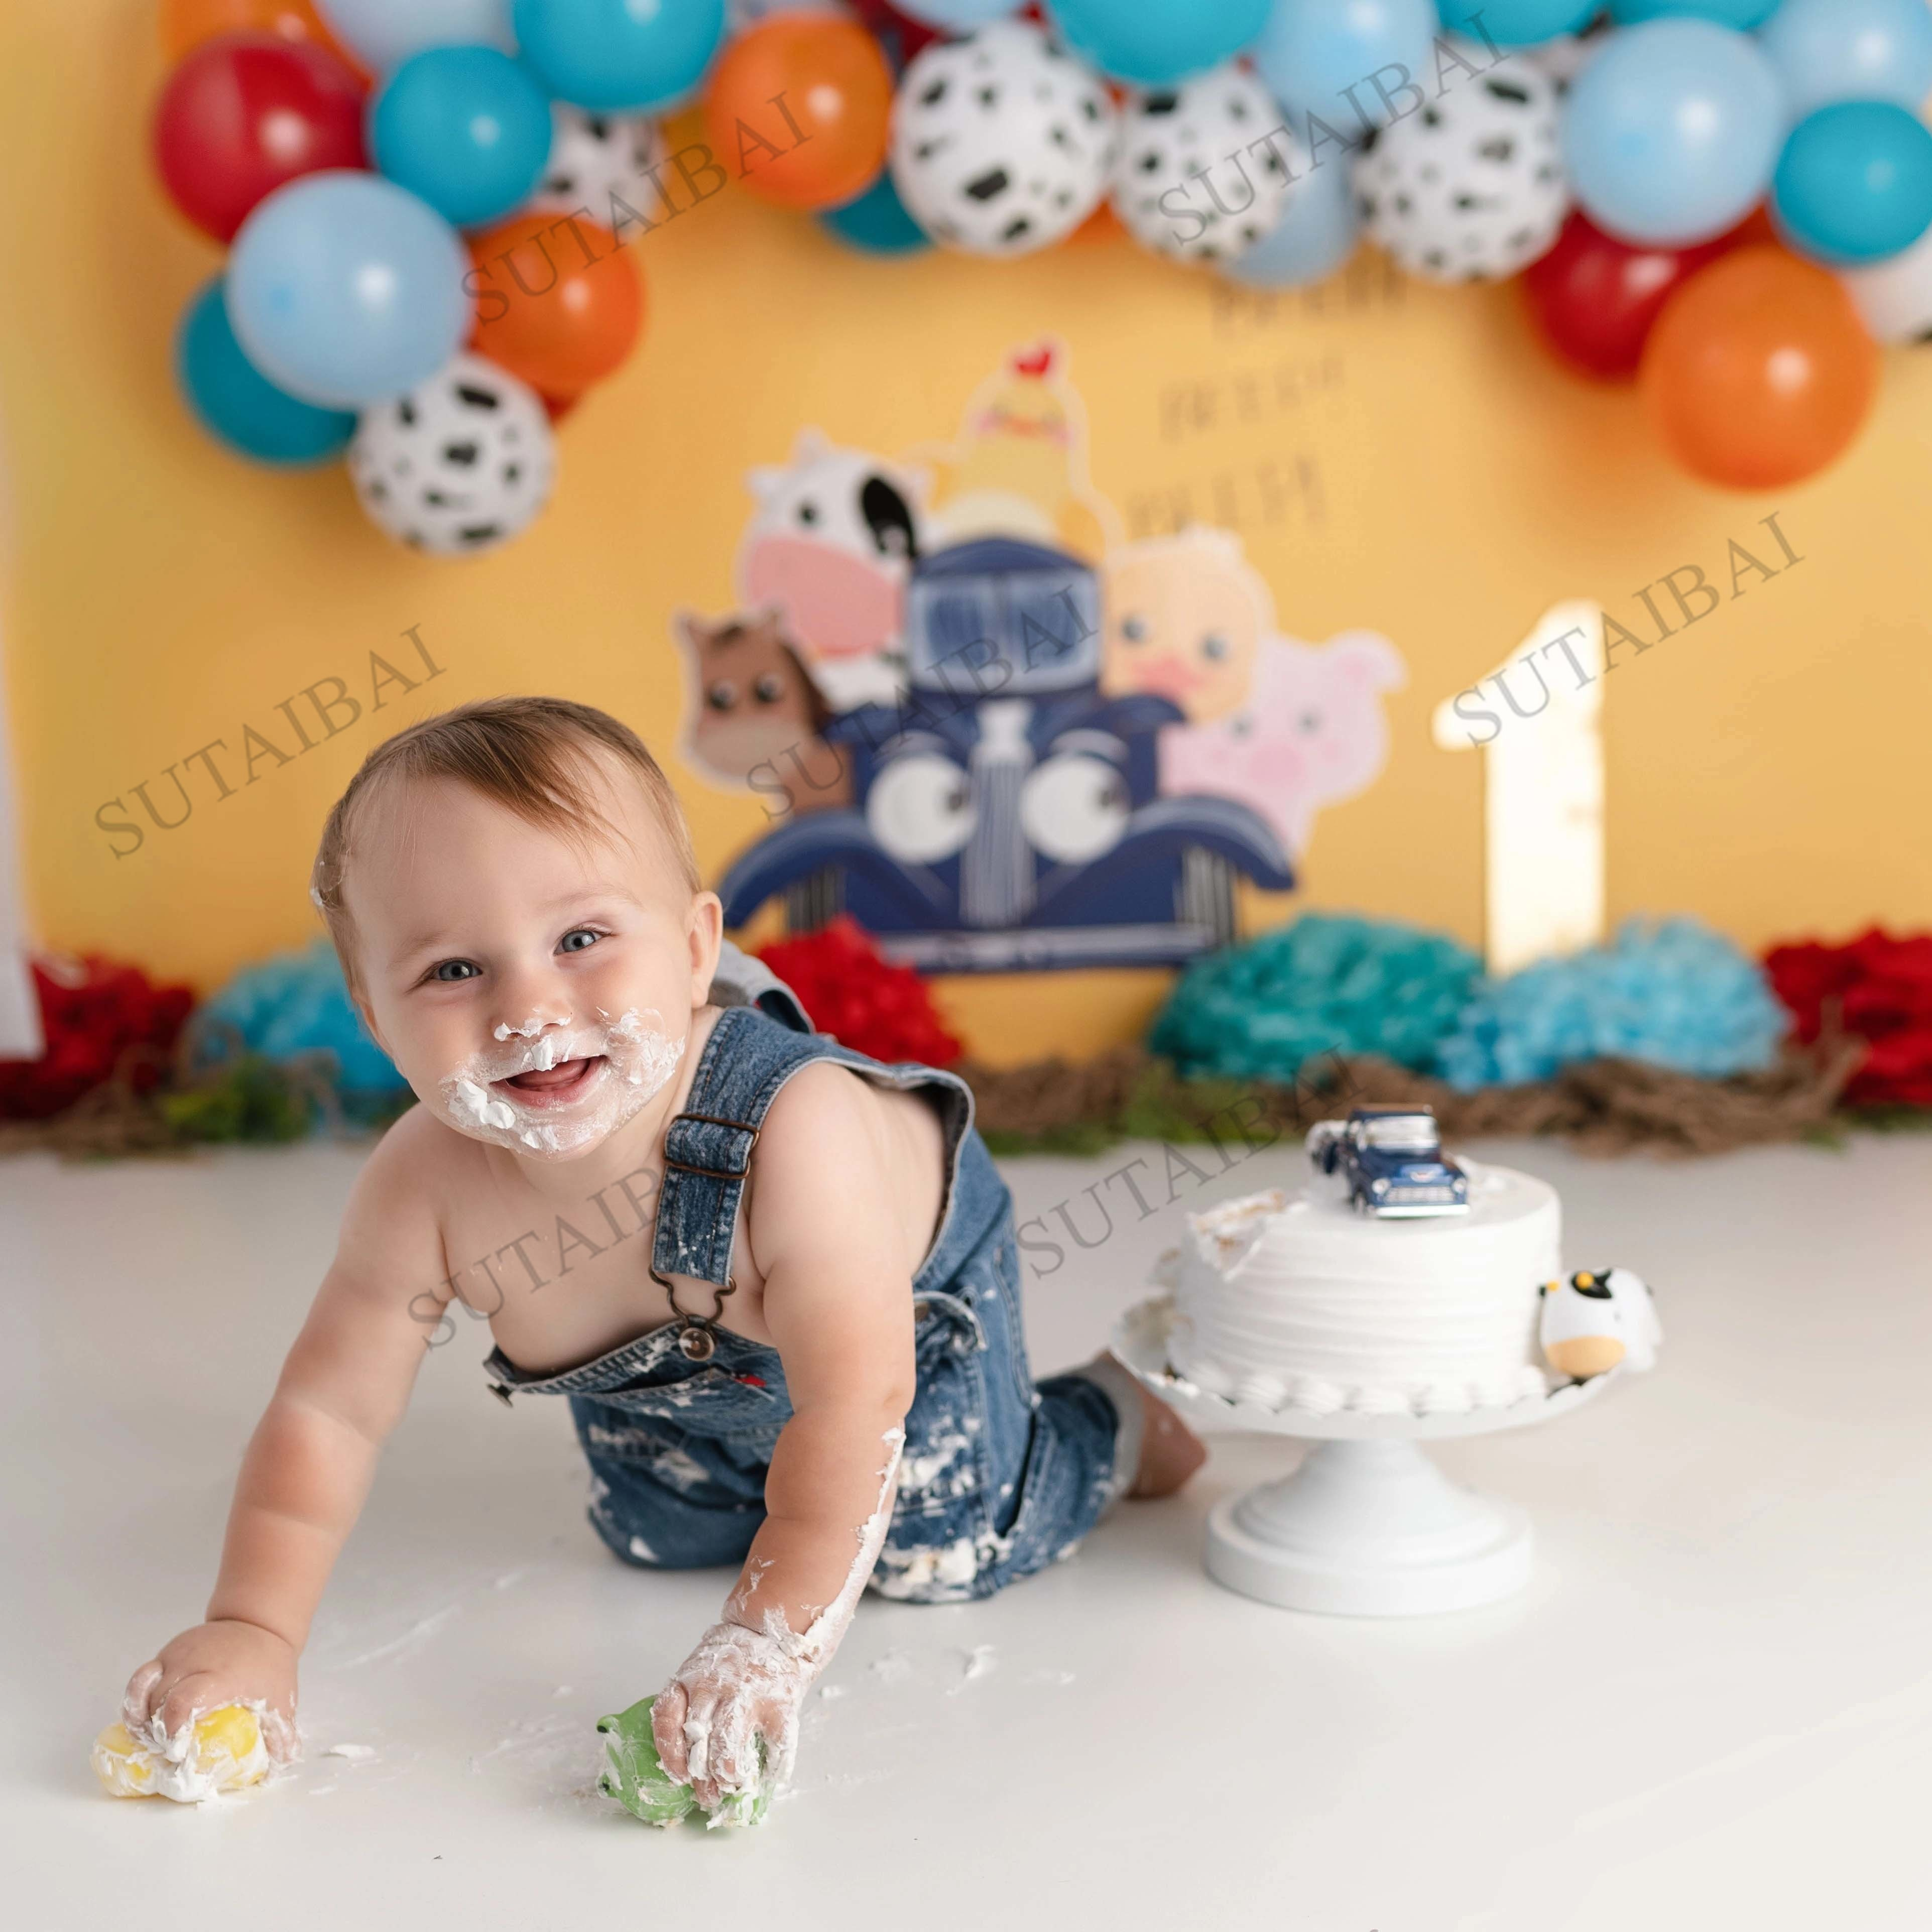 Animal Farm Cake Smash Photography Backdrops Kids 1st Birthday Photographic Studio Photo Backgrounds Colorful Balloon Decor enlarge